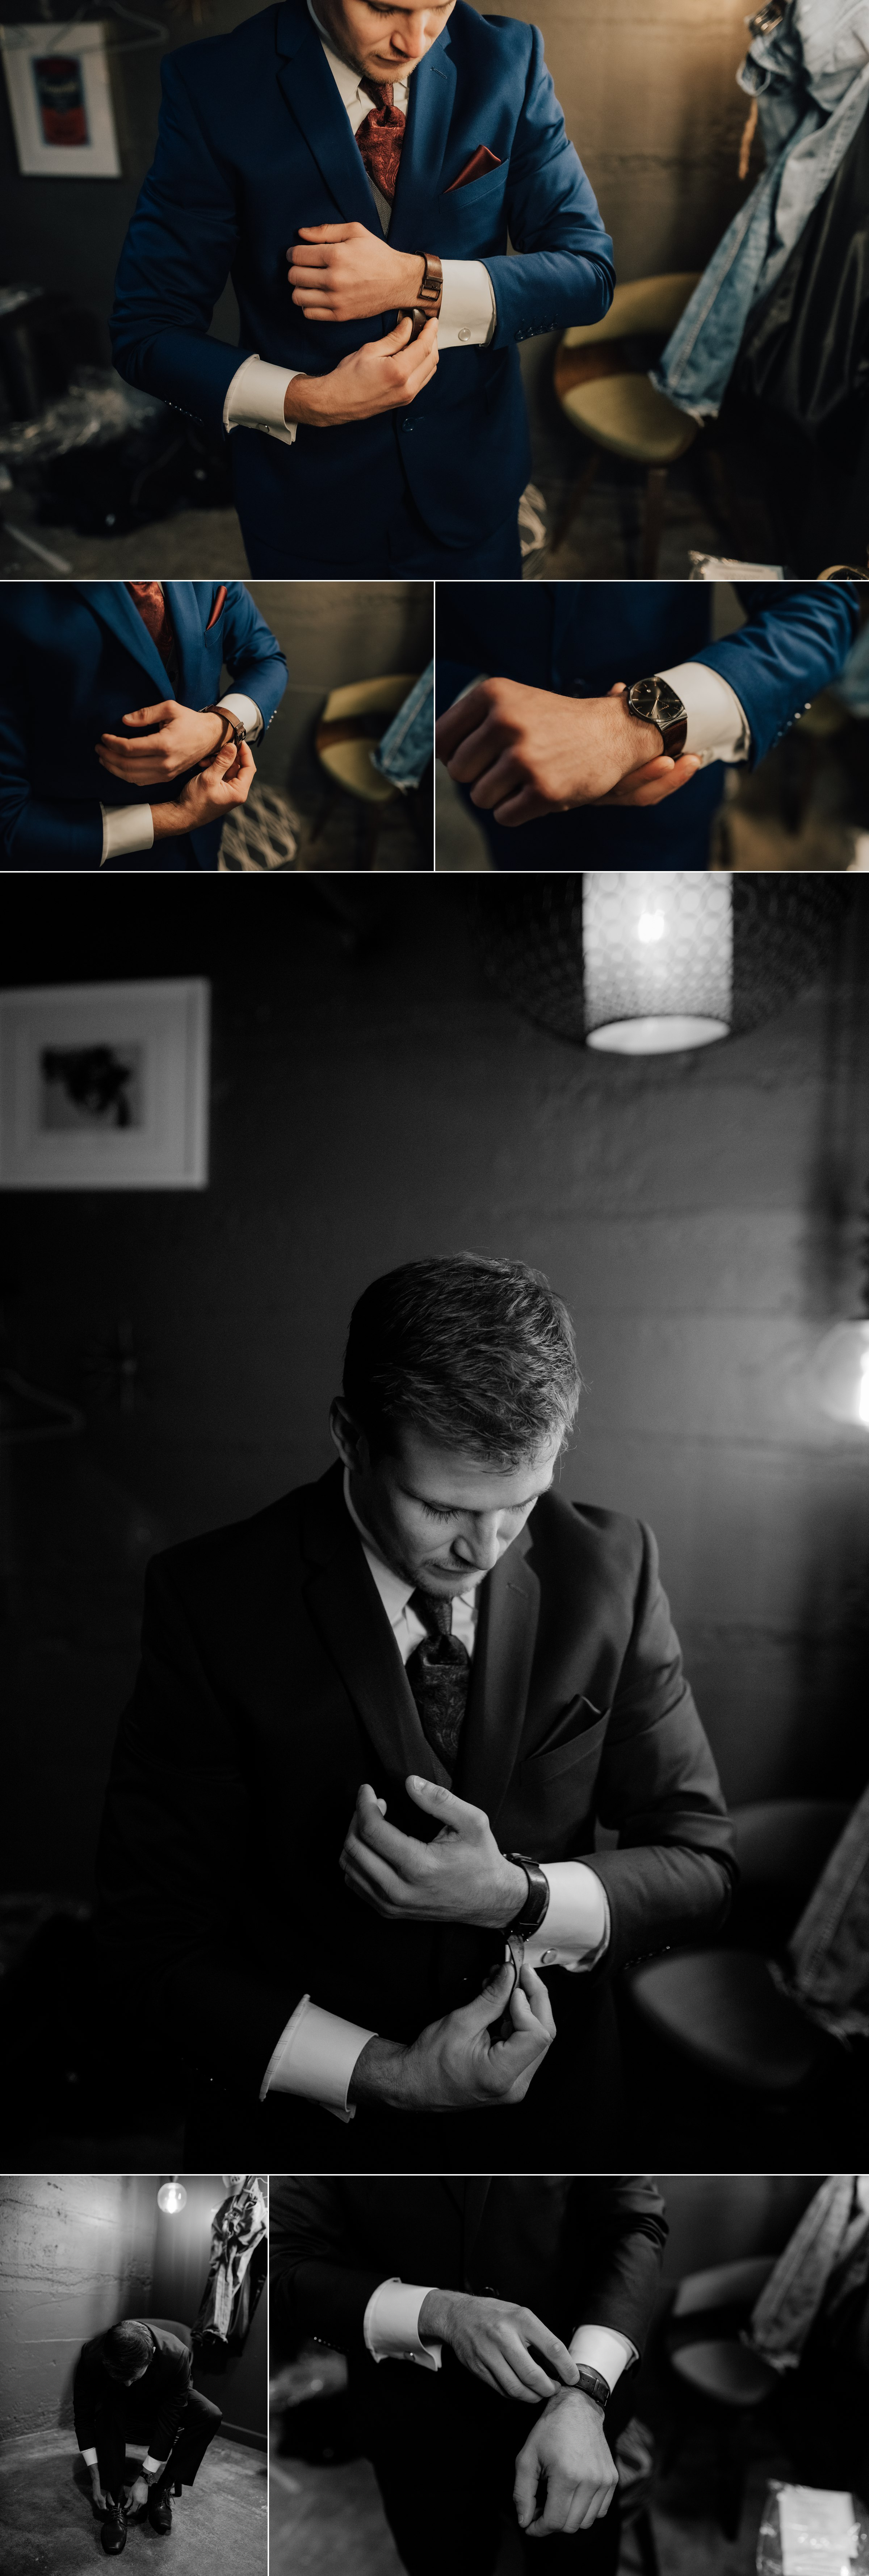 elopement-photographer-austin-best-wedding-minneapolis-adventurous-wedding-modern-morocco-new york-new orleans-mexica-costa rica-italy-affordable-best_0037.jpg